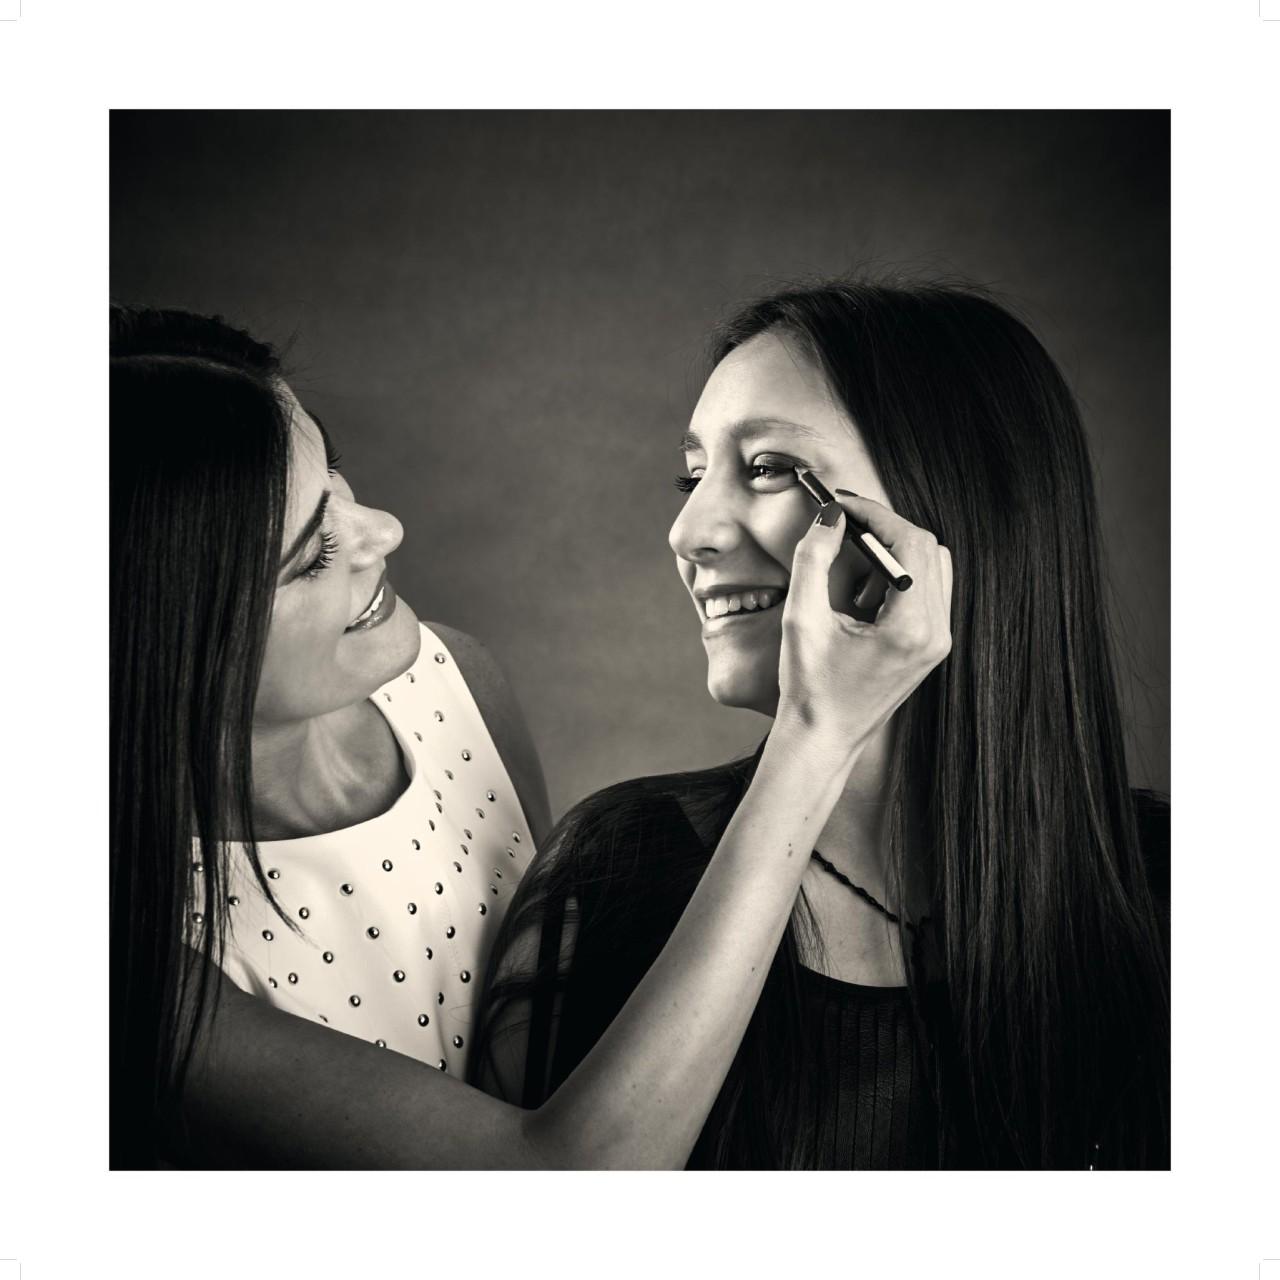 studio-fotografico-parma-francesca-chiara-03